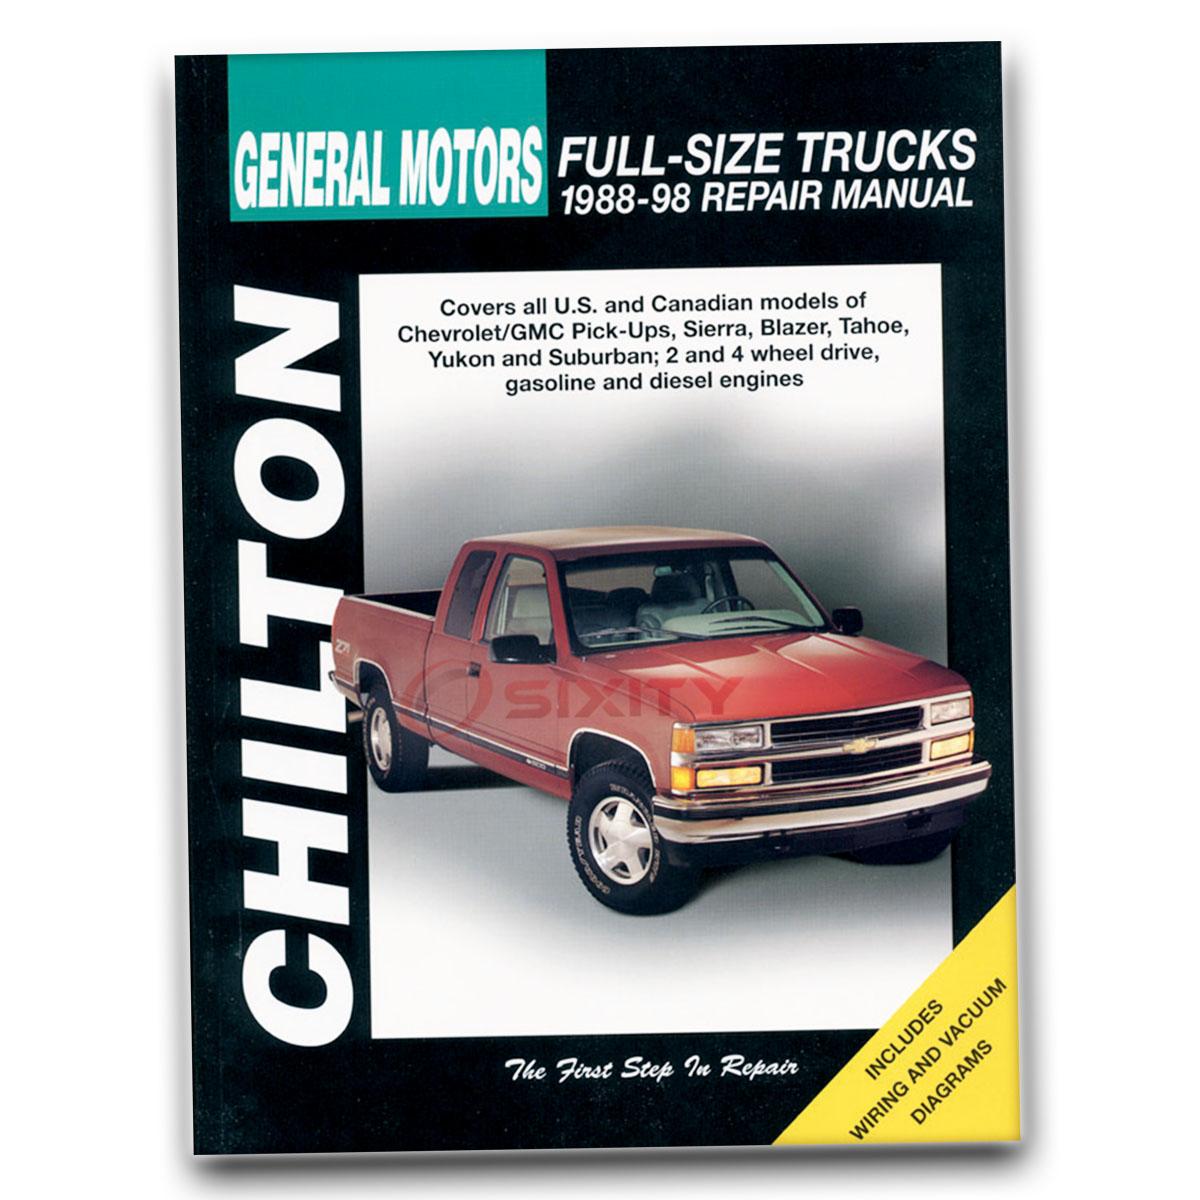 Chilton Repair Manual for GMC K1500 Sierra Special SLS SLT SLX SLE Sport xu